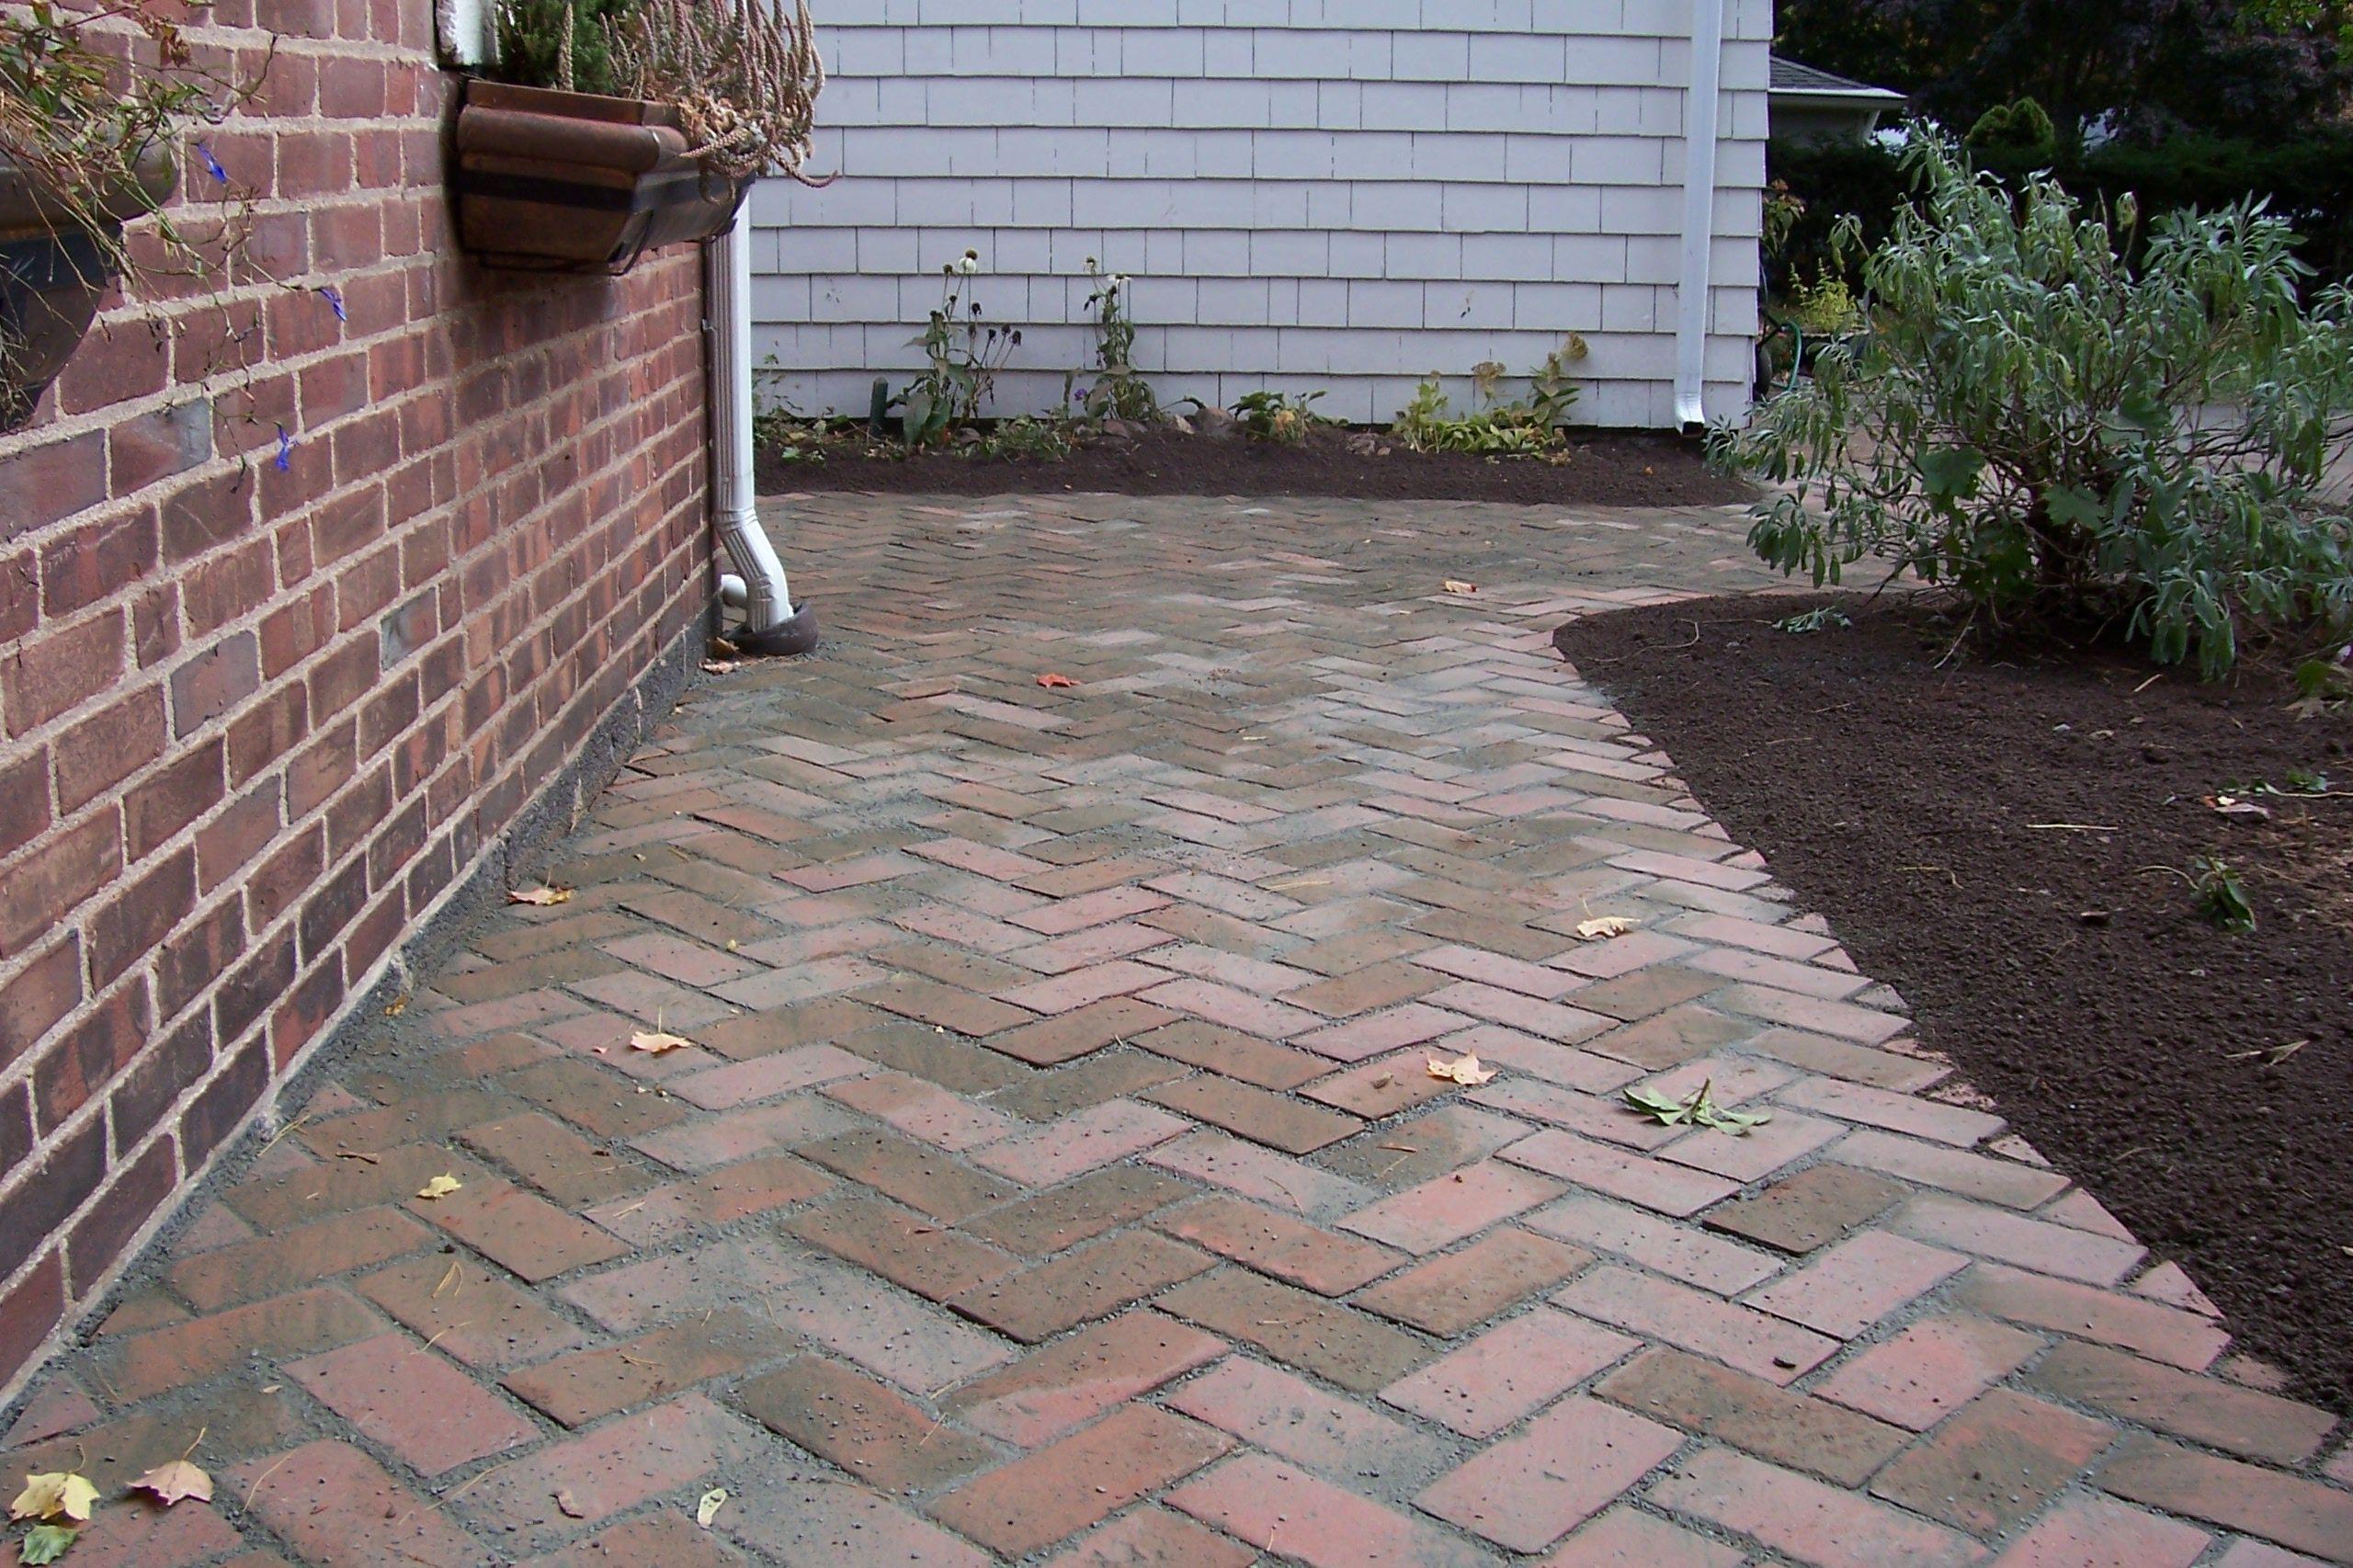 How to lay brick walkway - Exterior Herringbone Brick Walkway Brick Walkway Diy How To Lay A Curved Brick Walkway Laying Brick Walkway Brick Walkway Lined Design For Inexpensive